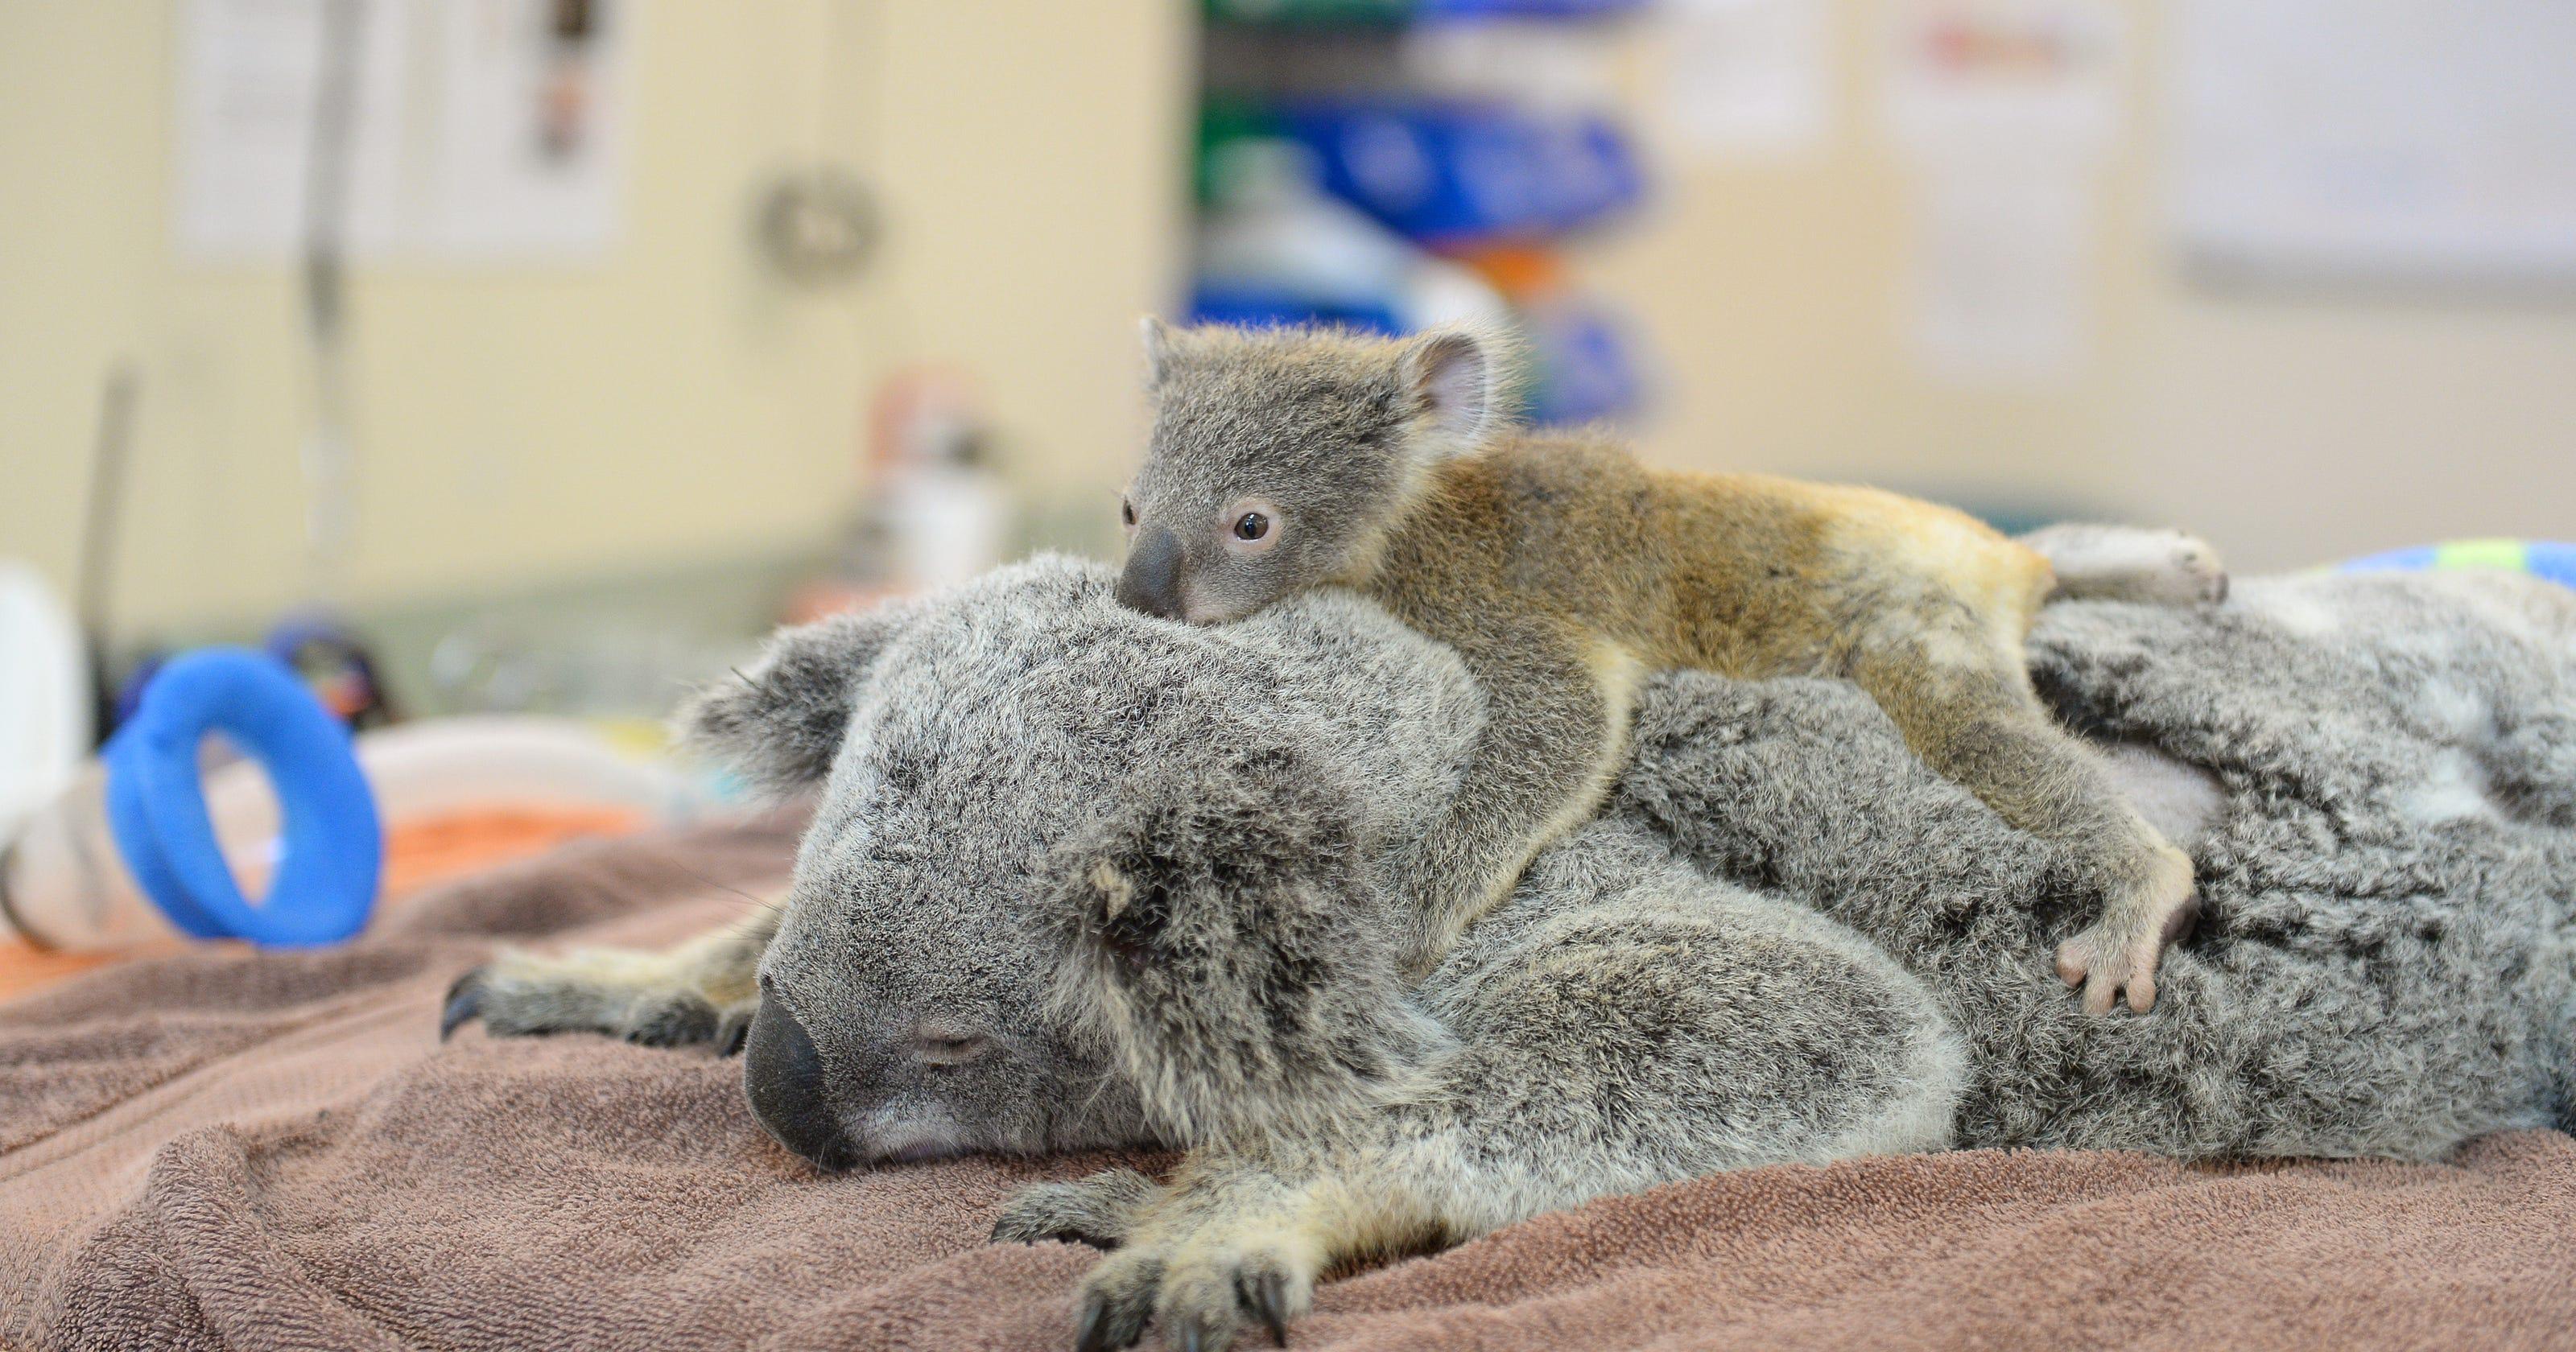 Baby koala hangs on to mom during life-saving surgery